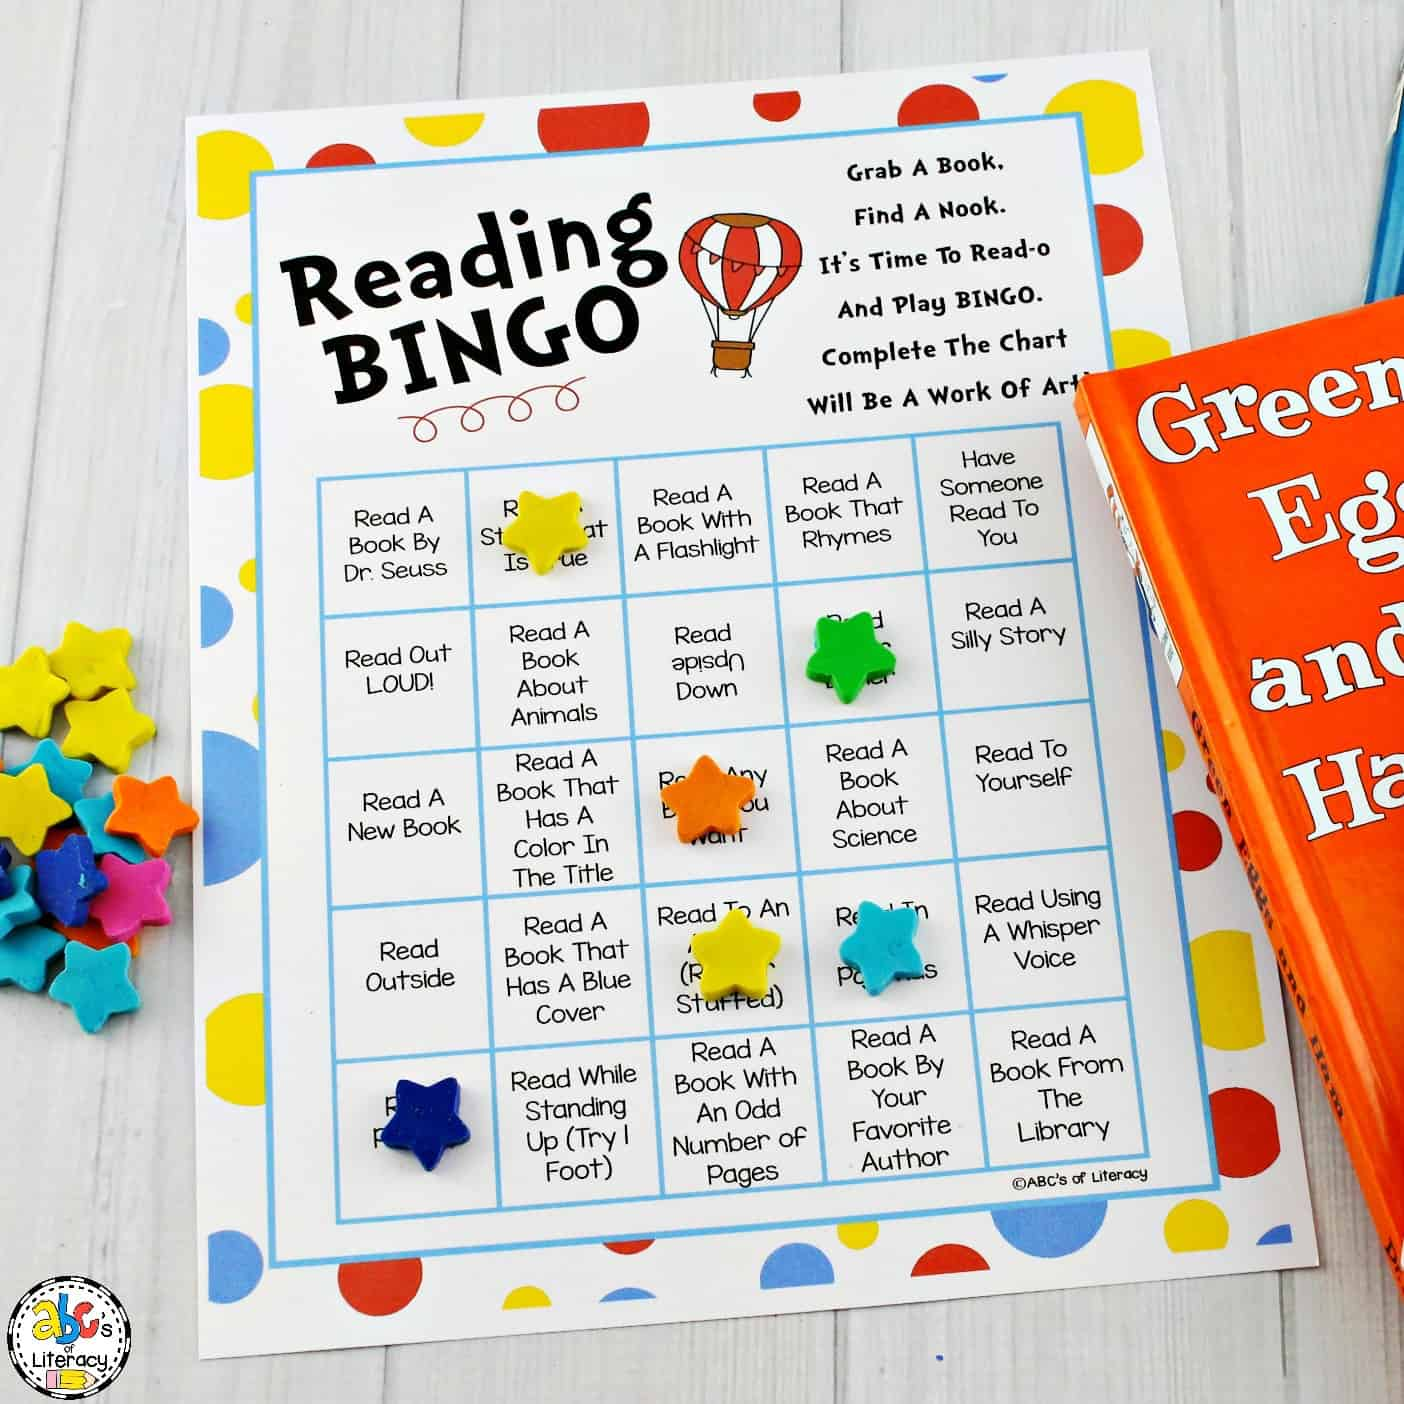 Celebrate Reading Month With This Fun Reading Bingo